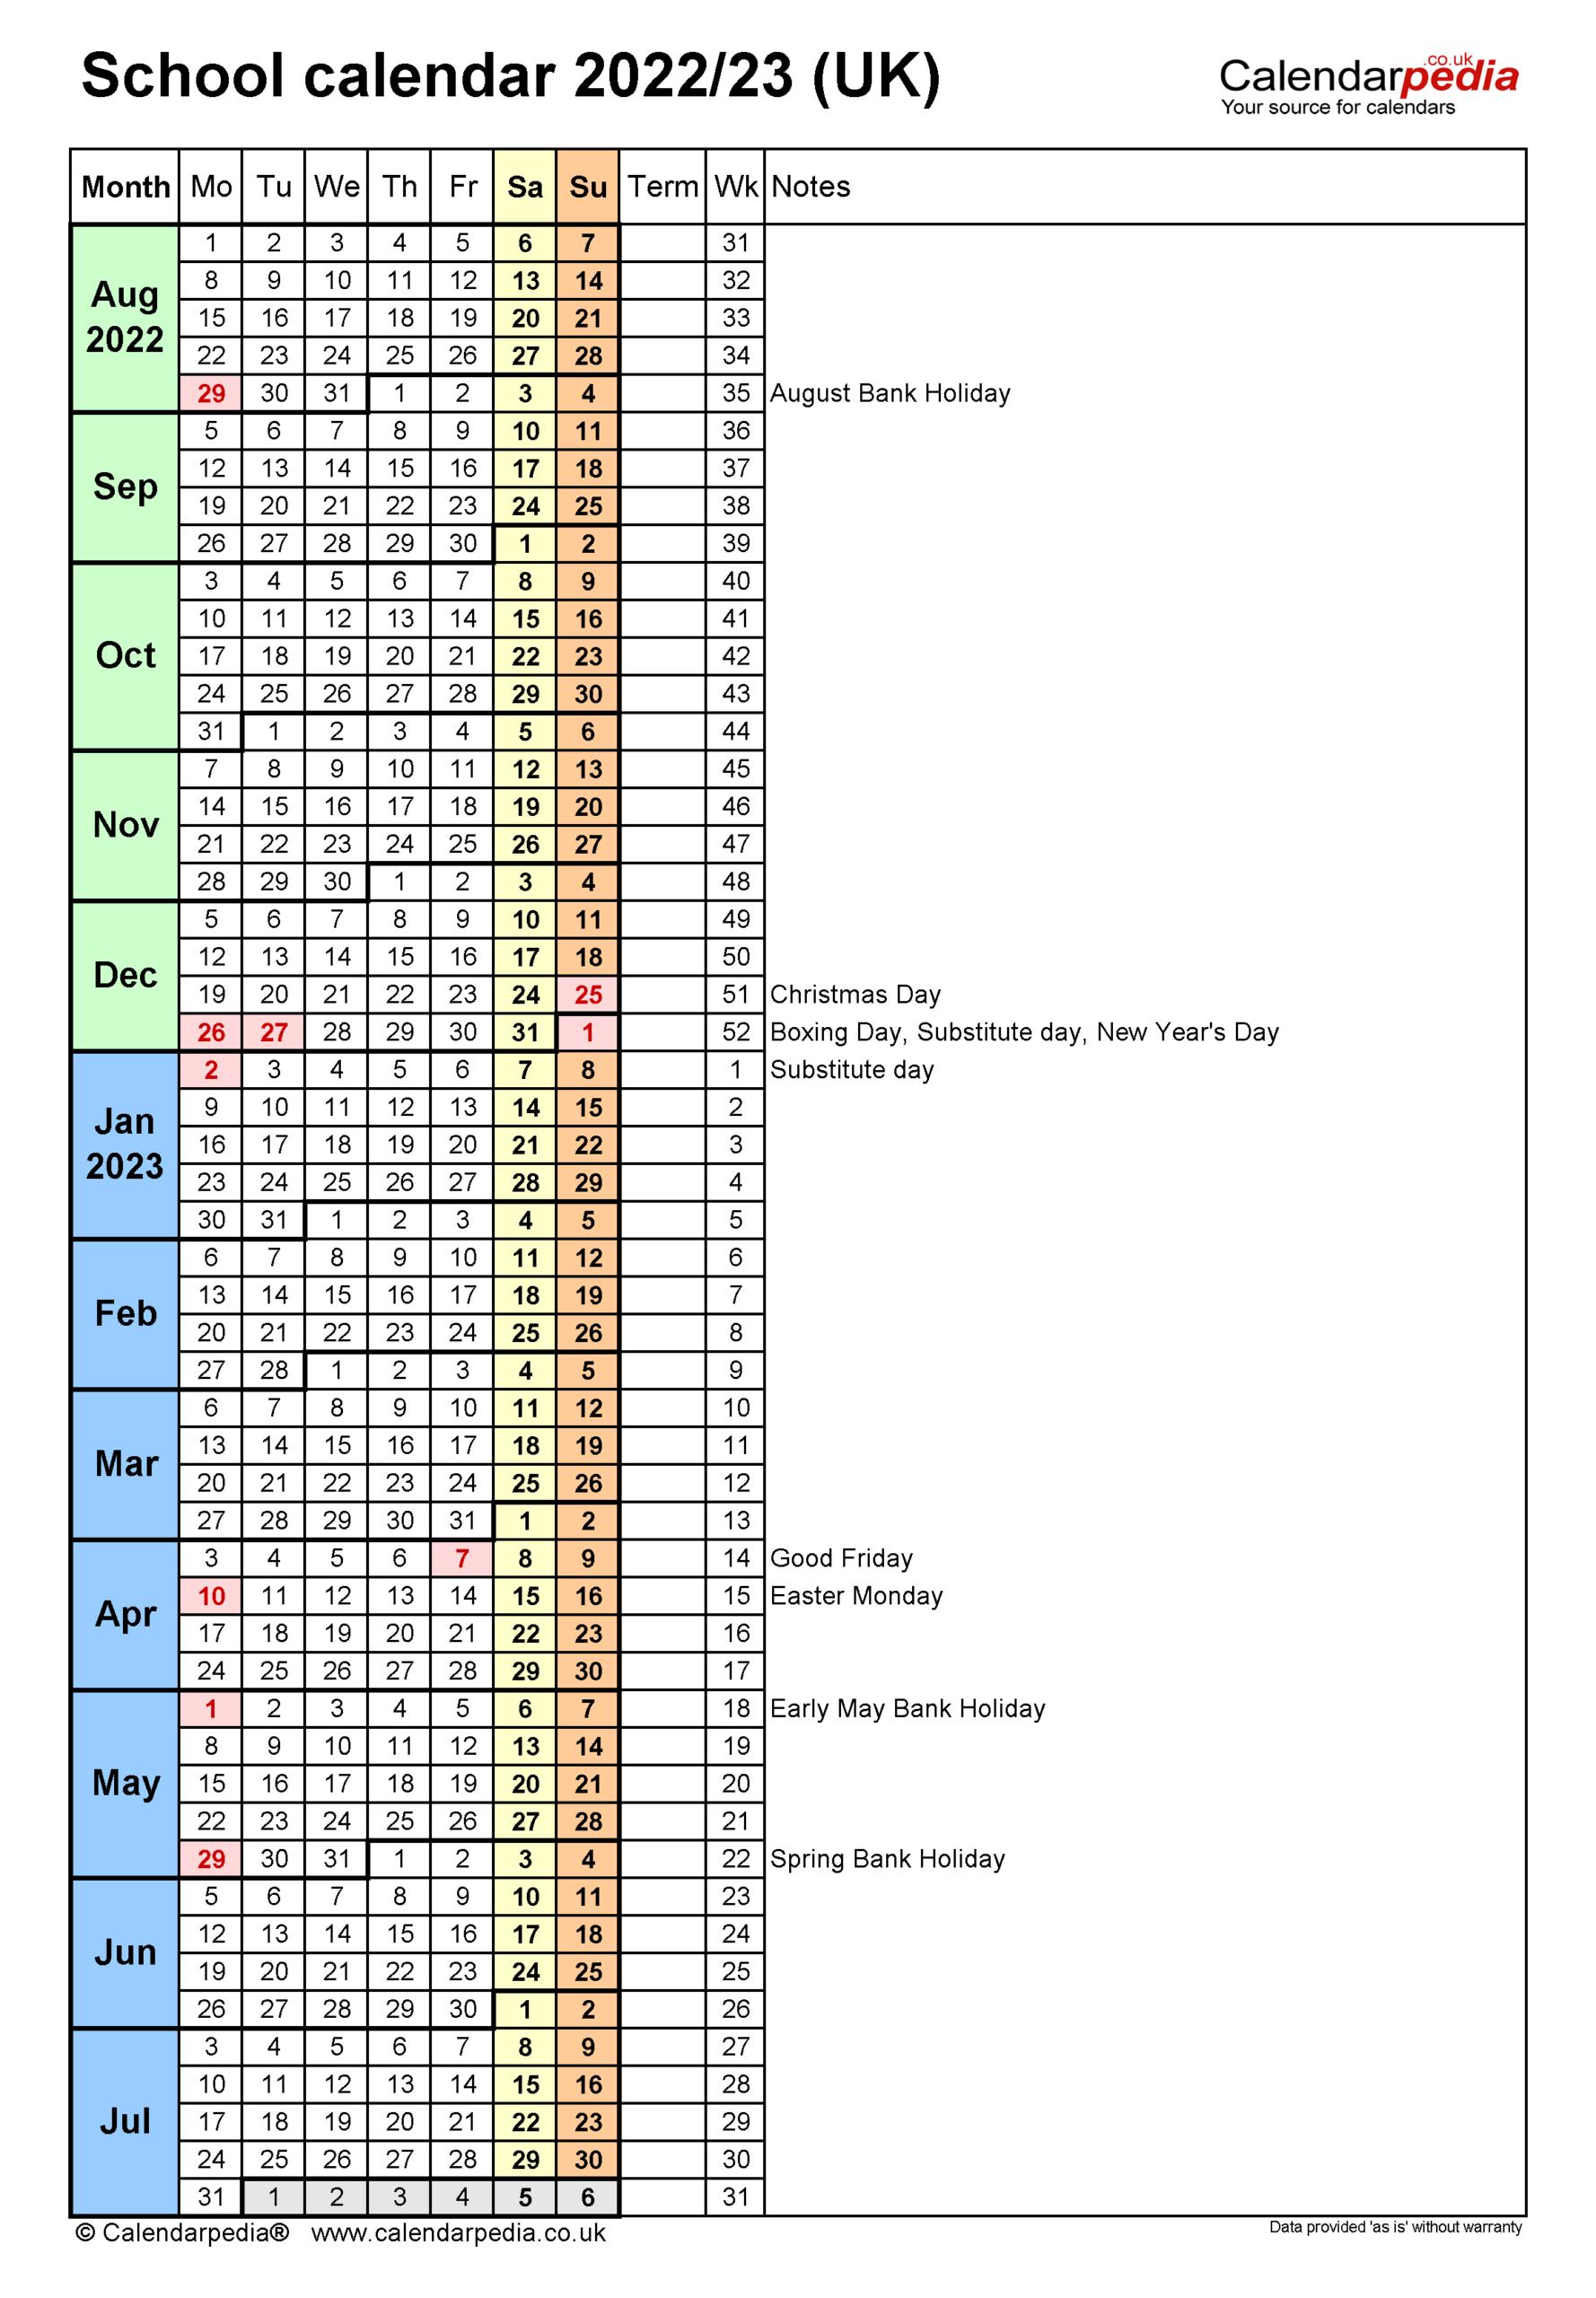 School Calendars 2022/2023 As Free Printable Pdf Templates throughout 2022 2023 School Calendar North Penn